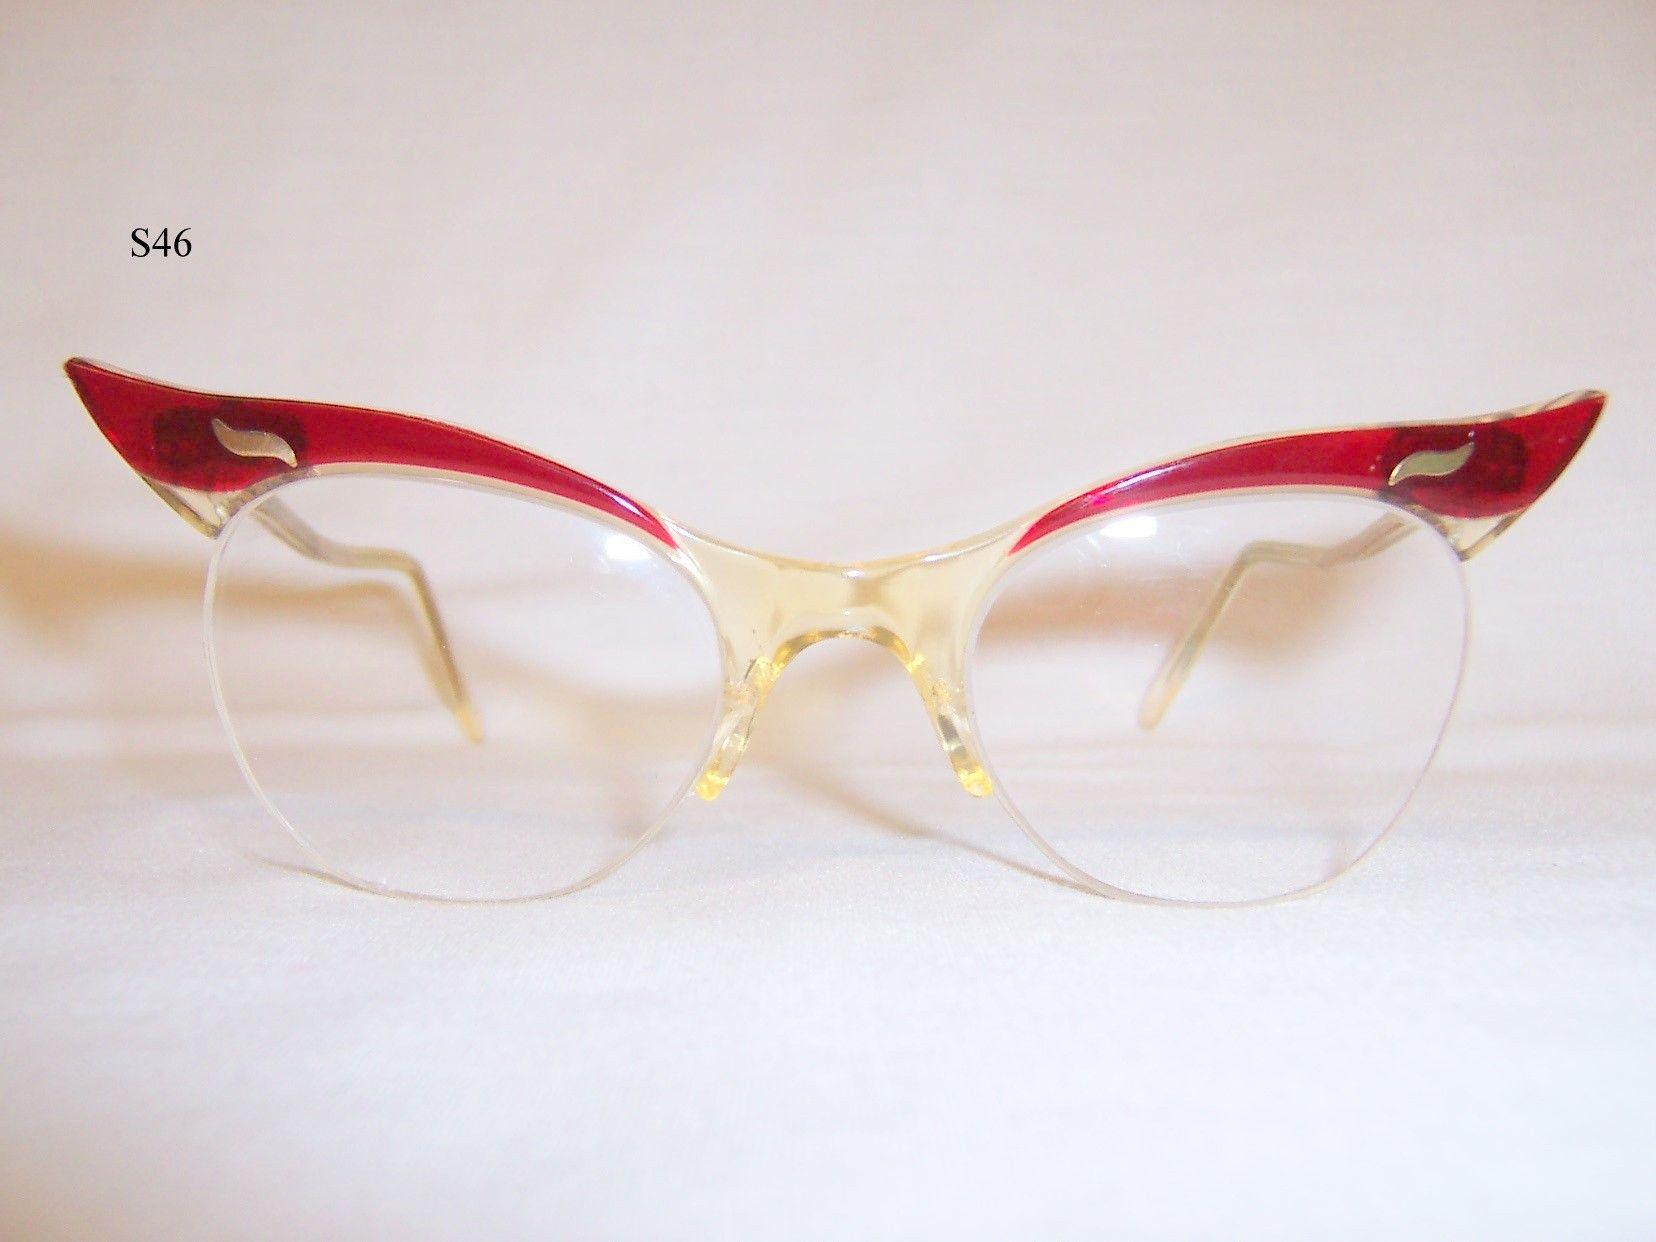 Classic 1950 60s Semi Rimless Supra Spectacles Red Vintage Glasses Retro Glasses Vintage Glasses Glasses